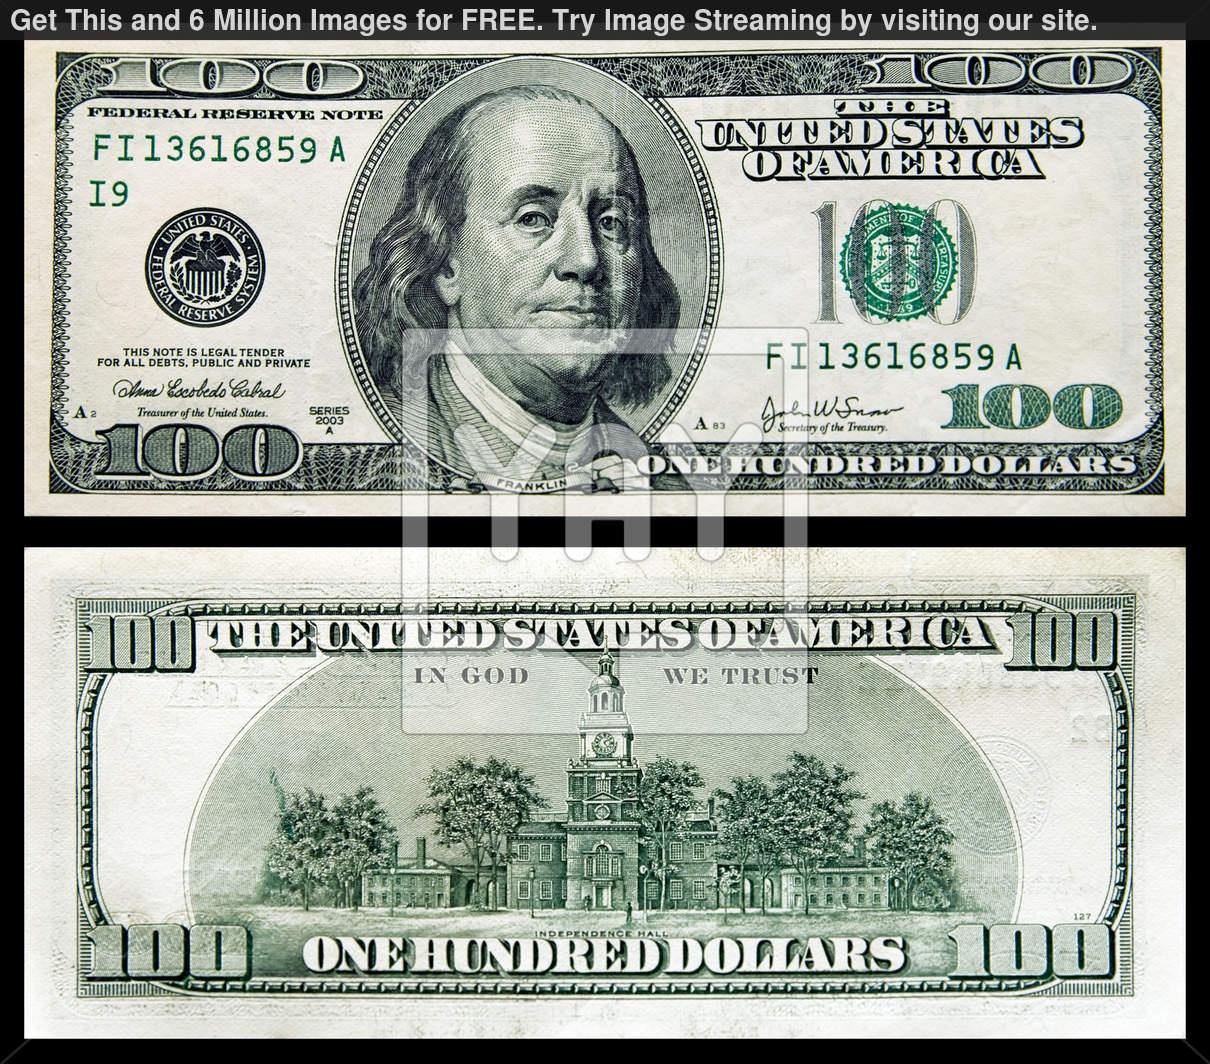 14 Hundred Dollar Bill Psd Images - 100 Dollar Bill Without Face - Free Printable 100 Dollar Bill